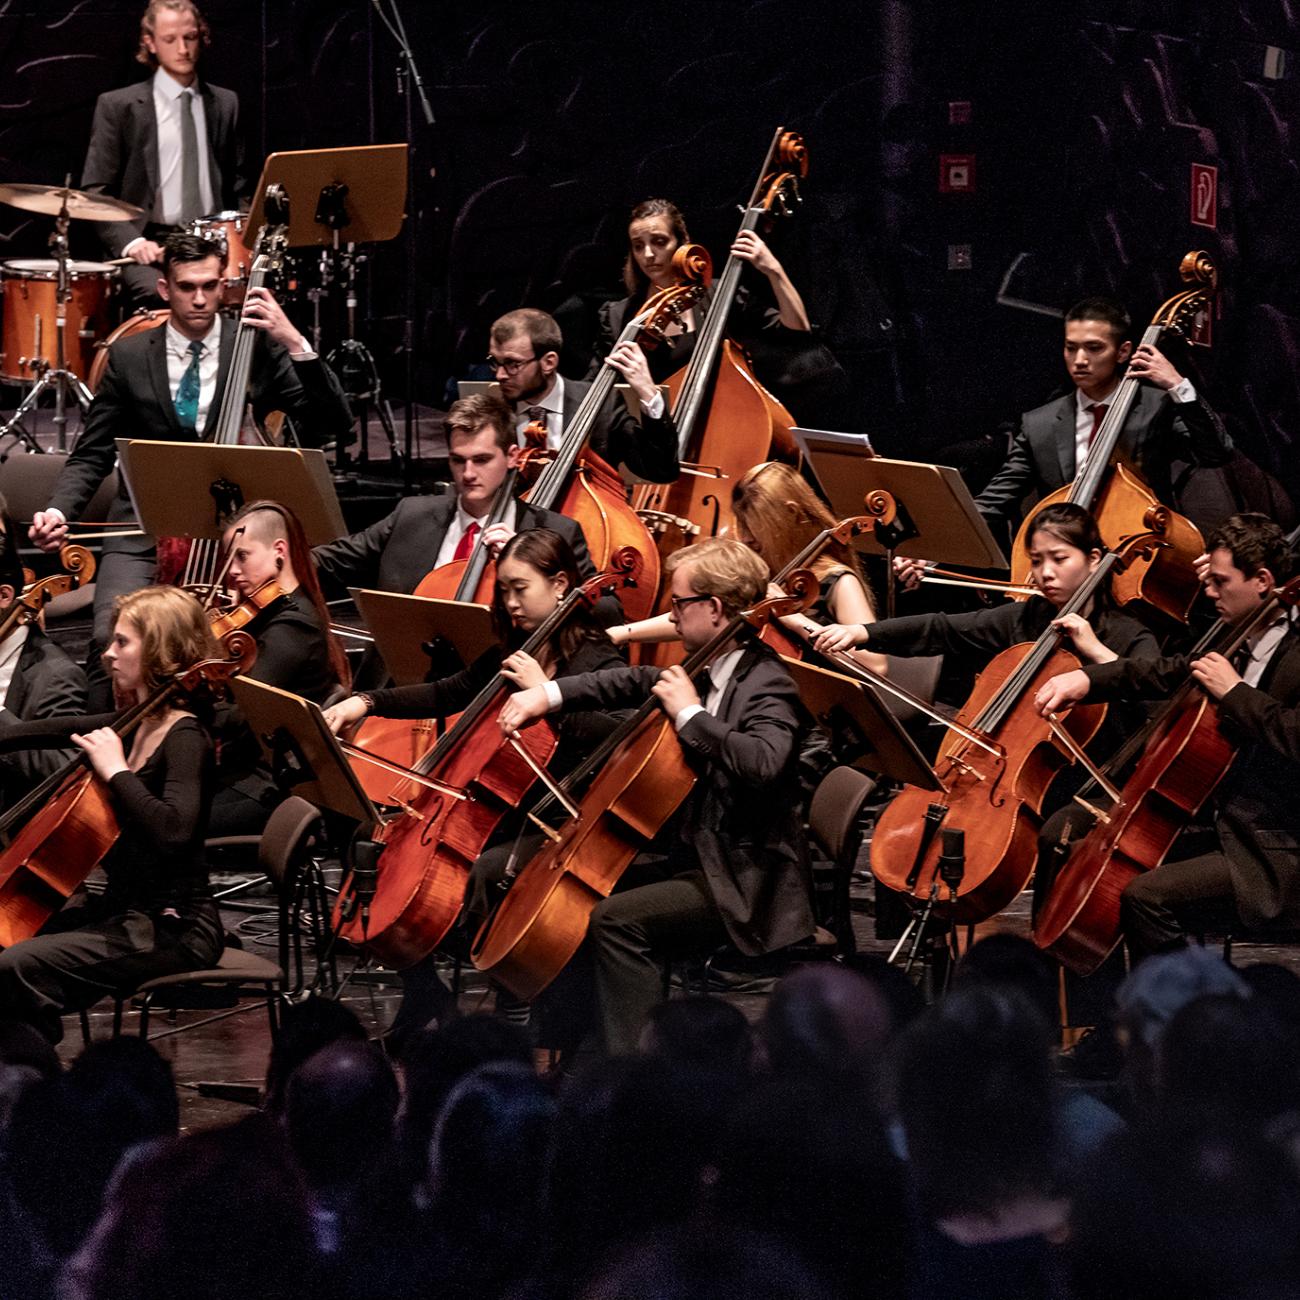 Orchesterkonzert